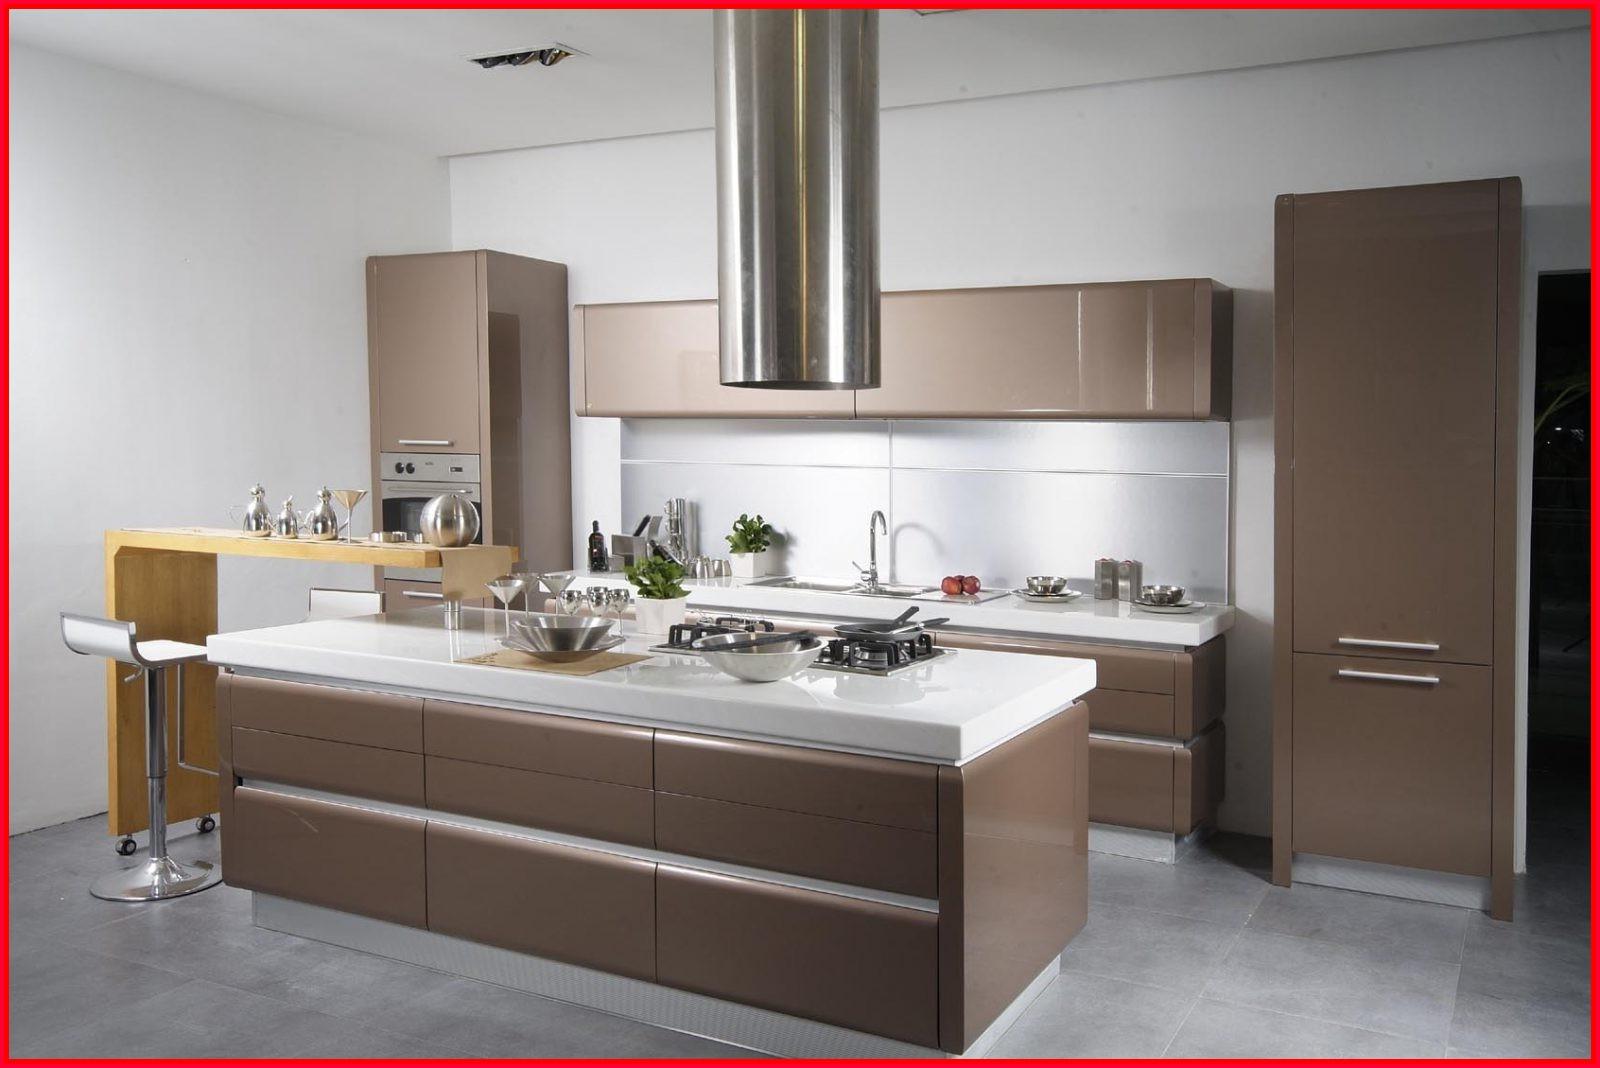 Muebles De Cocina Ikea Baratos Etdg Catà Logo Cocinas Ikea 2019 ...